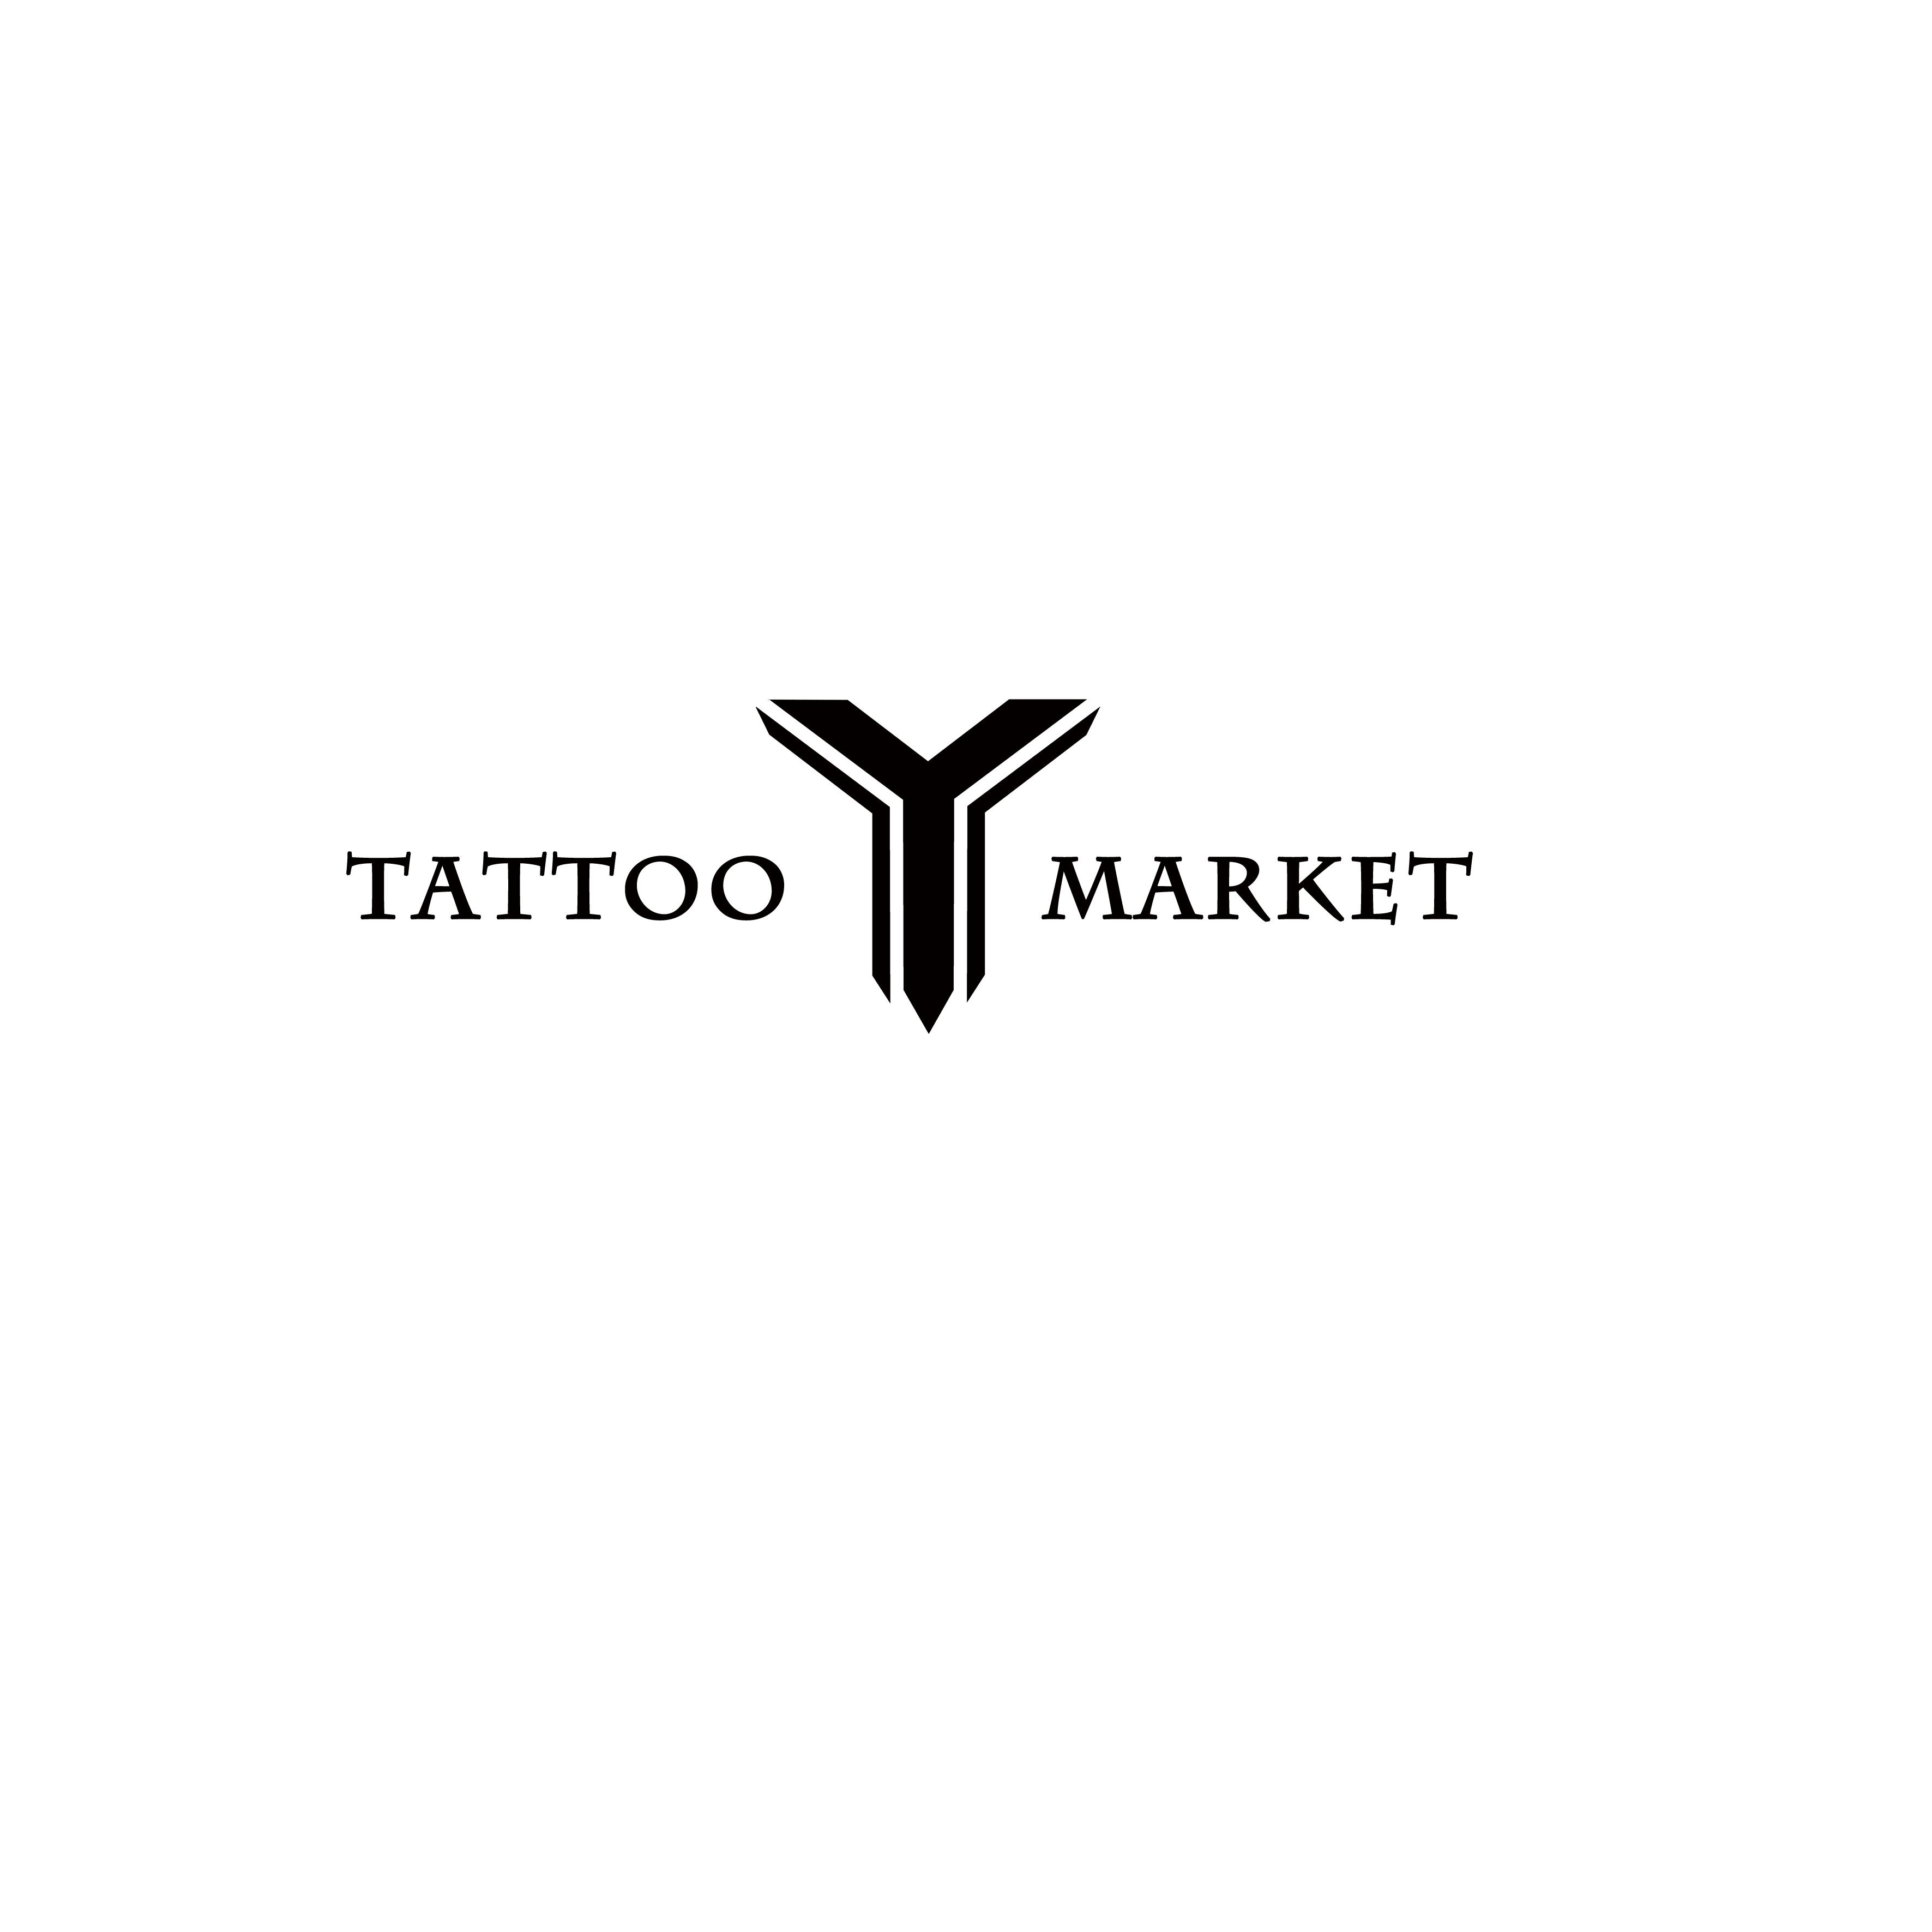 Редизайн логотипа магазина тату оборудования TattooMarket.ru фото f_9315c3a6639b7553.jpg